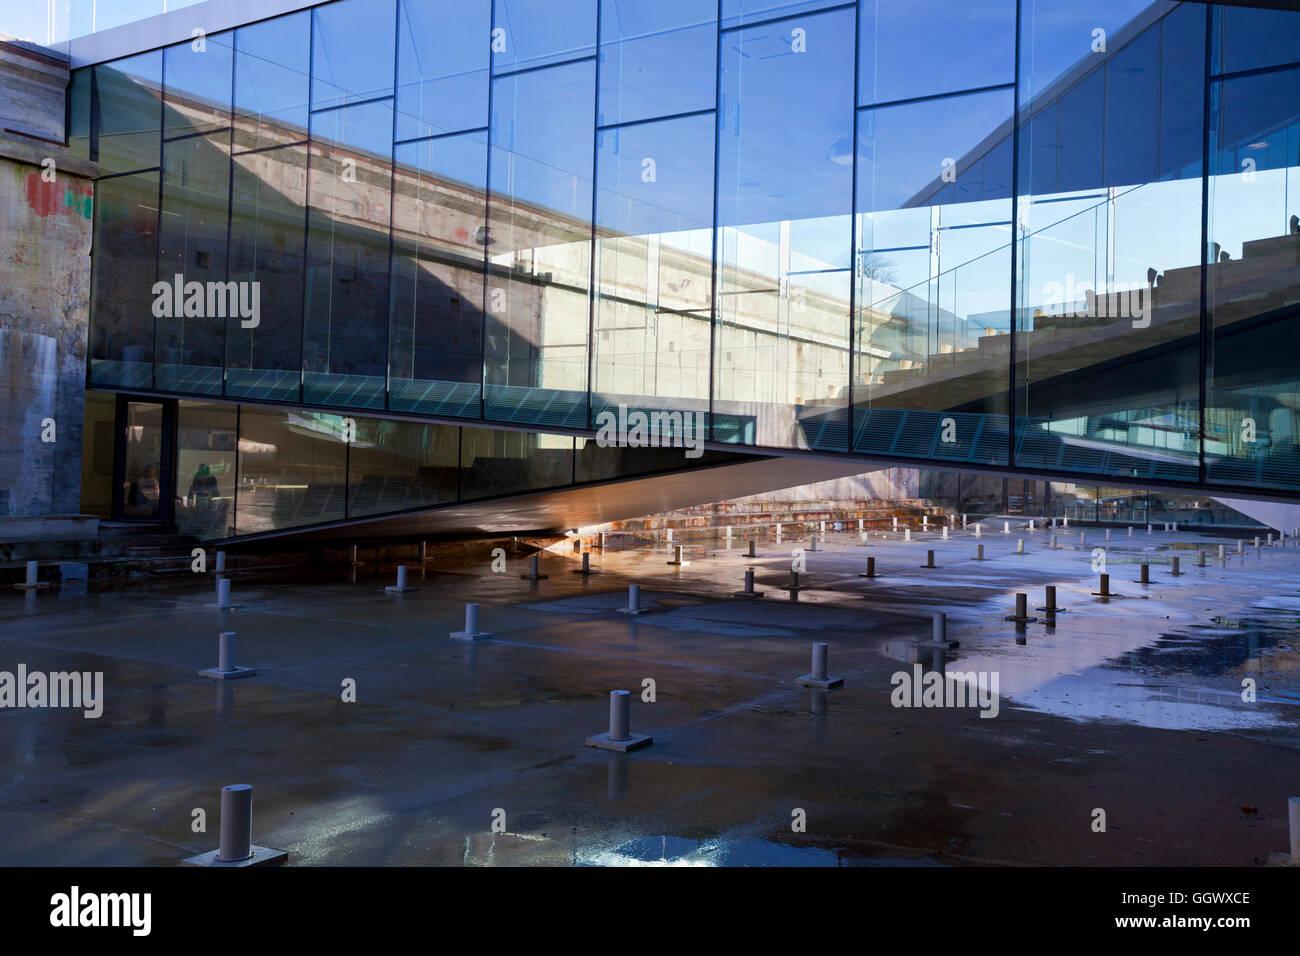 Danese Museo Marittimo, M/S Museet per Søfart a Elsinore / Helsingør, Danimarca. L'architetto Bjarke Ingels BIG. La riflessione in metropolitana da pareti in vetro Foto Stock